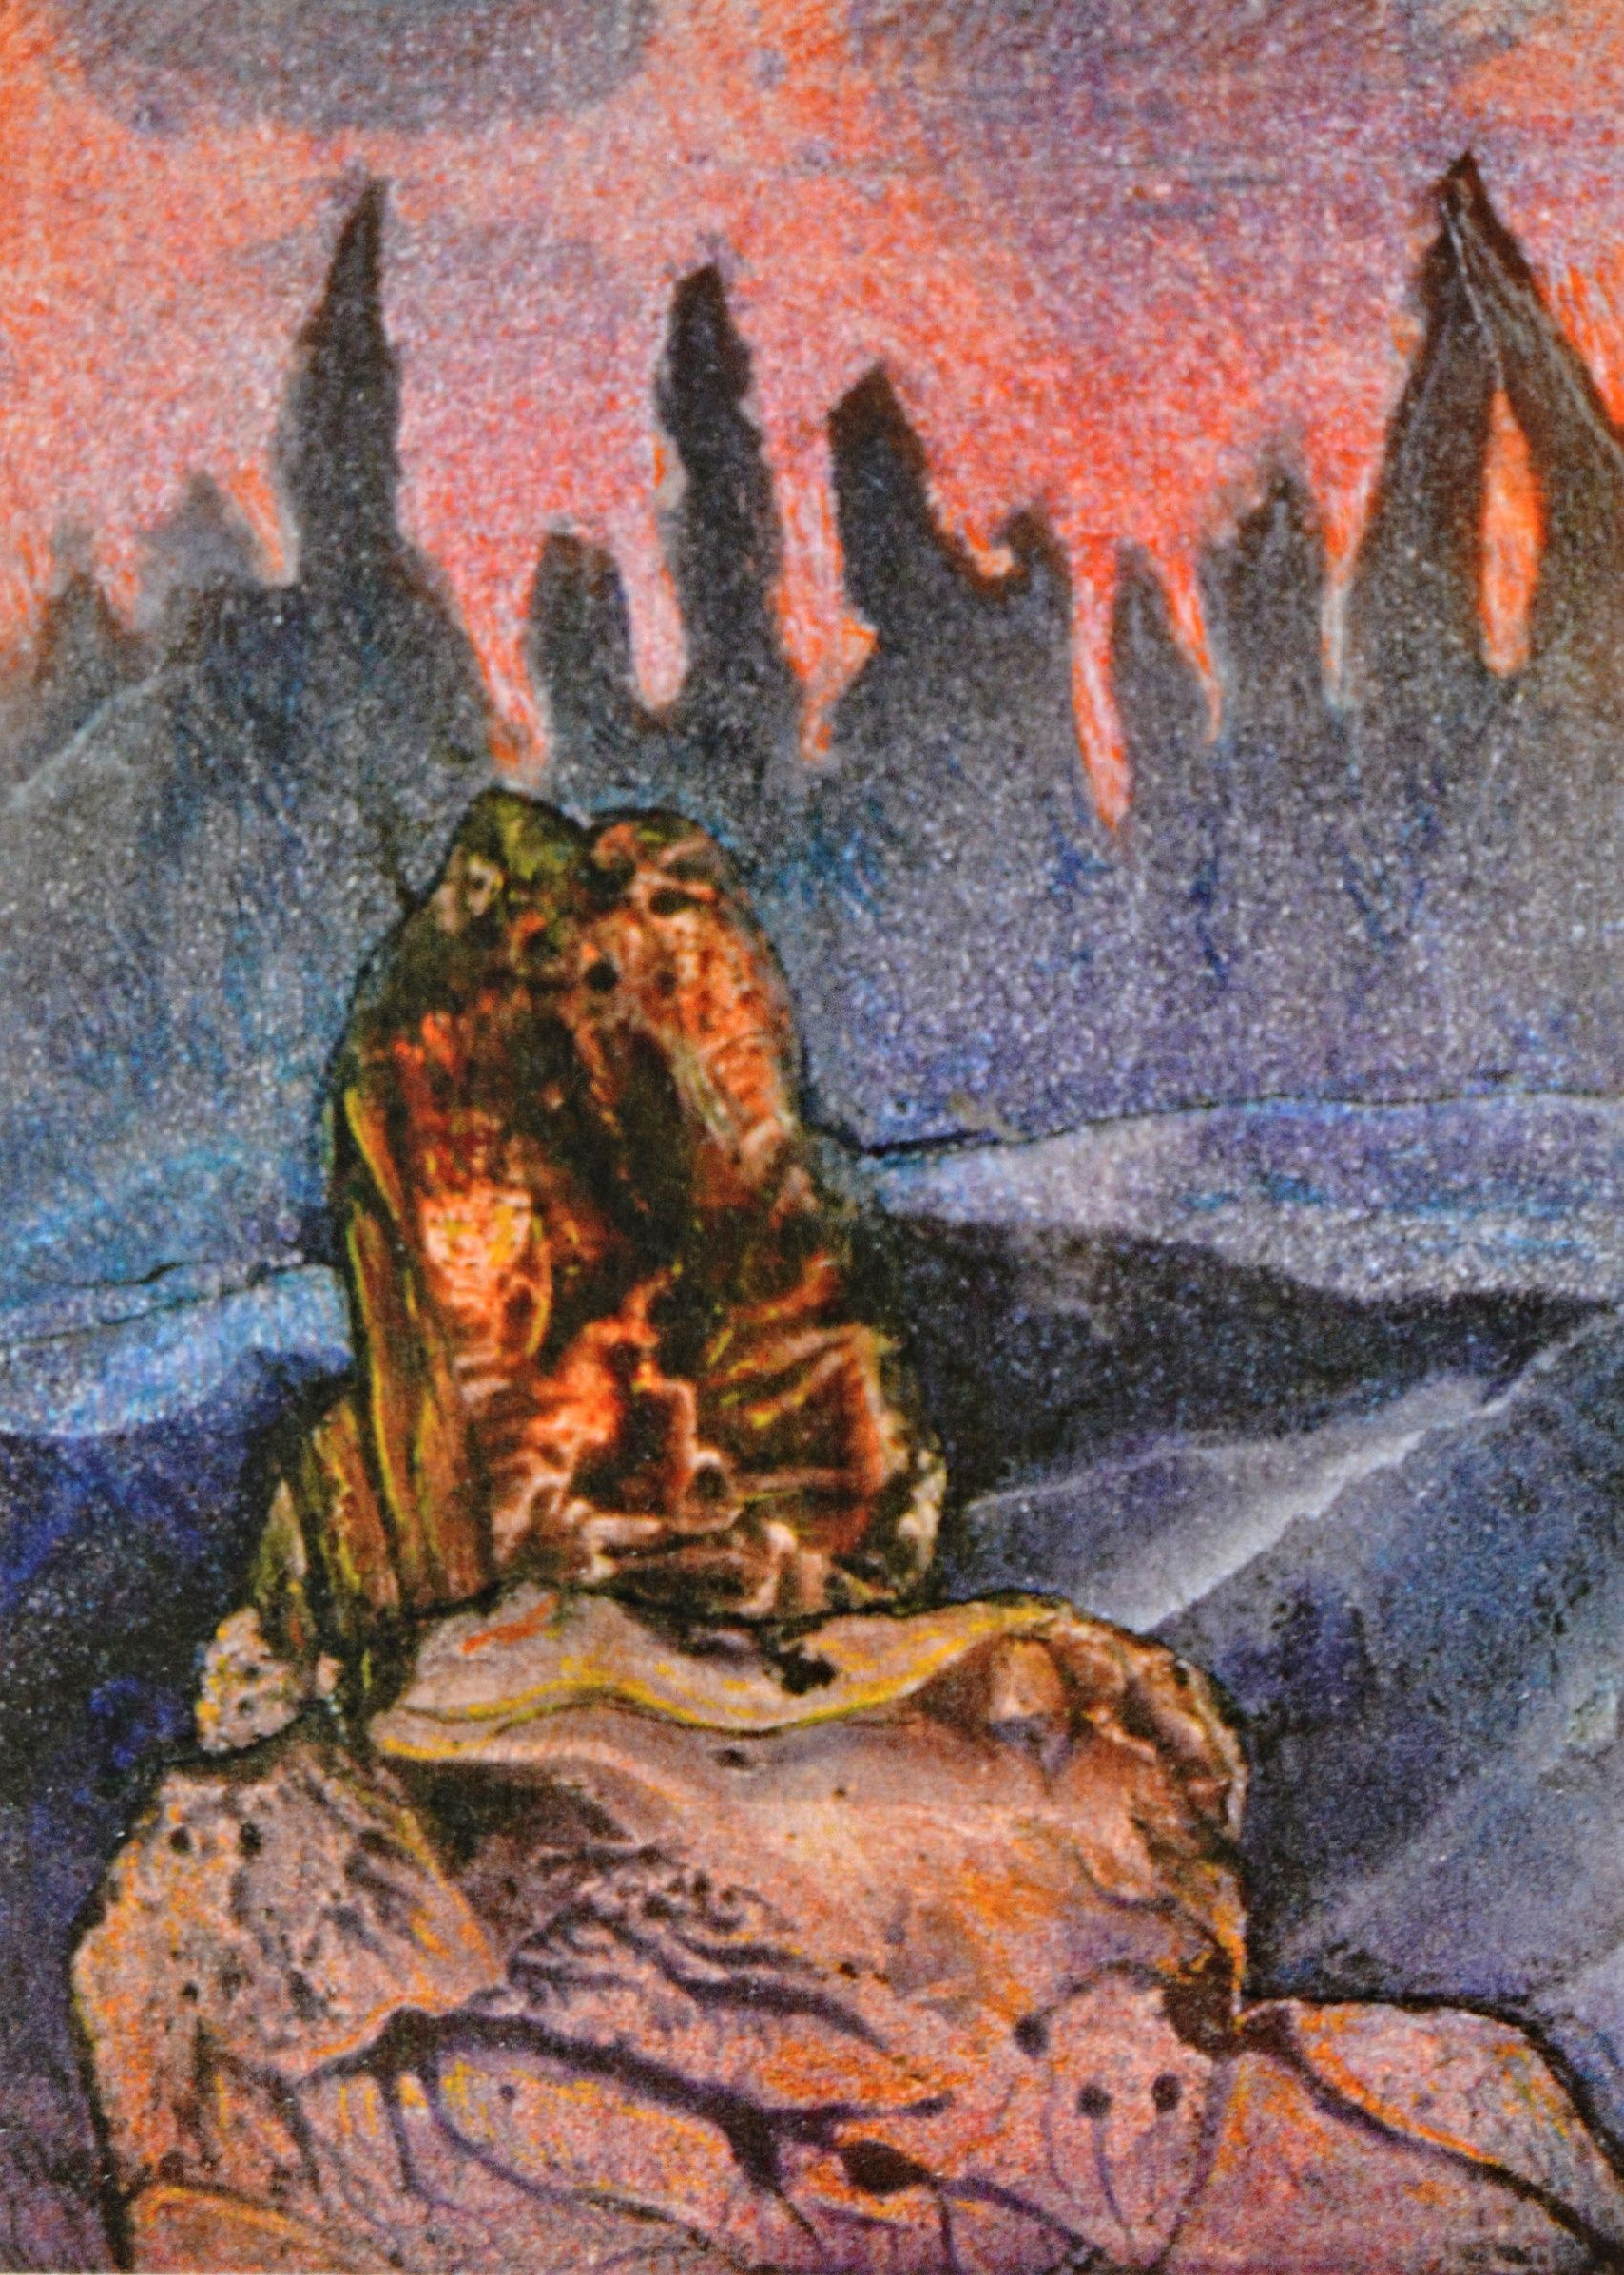 Josef Kremláček: ilustrace k francouzsko-české bibliofilii Arnošta Budíka Les îles perdues, Ztracené ostrovy, Amaprint-Kerndl, Třebíč 2005. Foto: Jan Dočekal